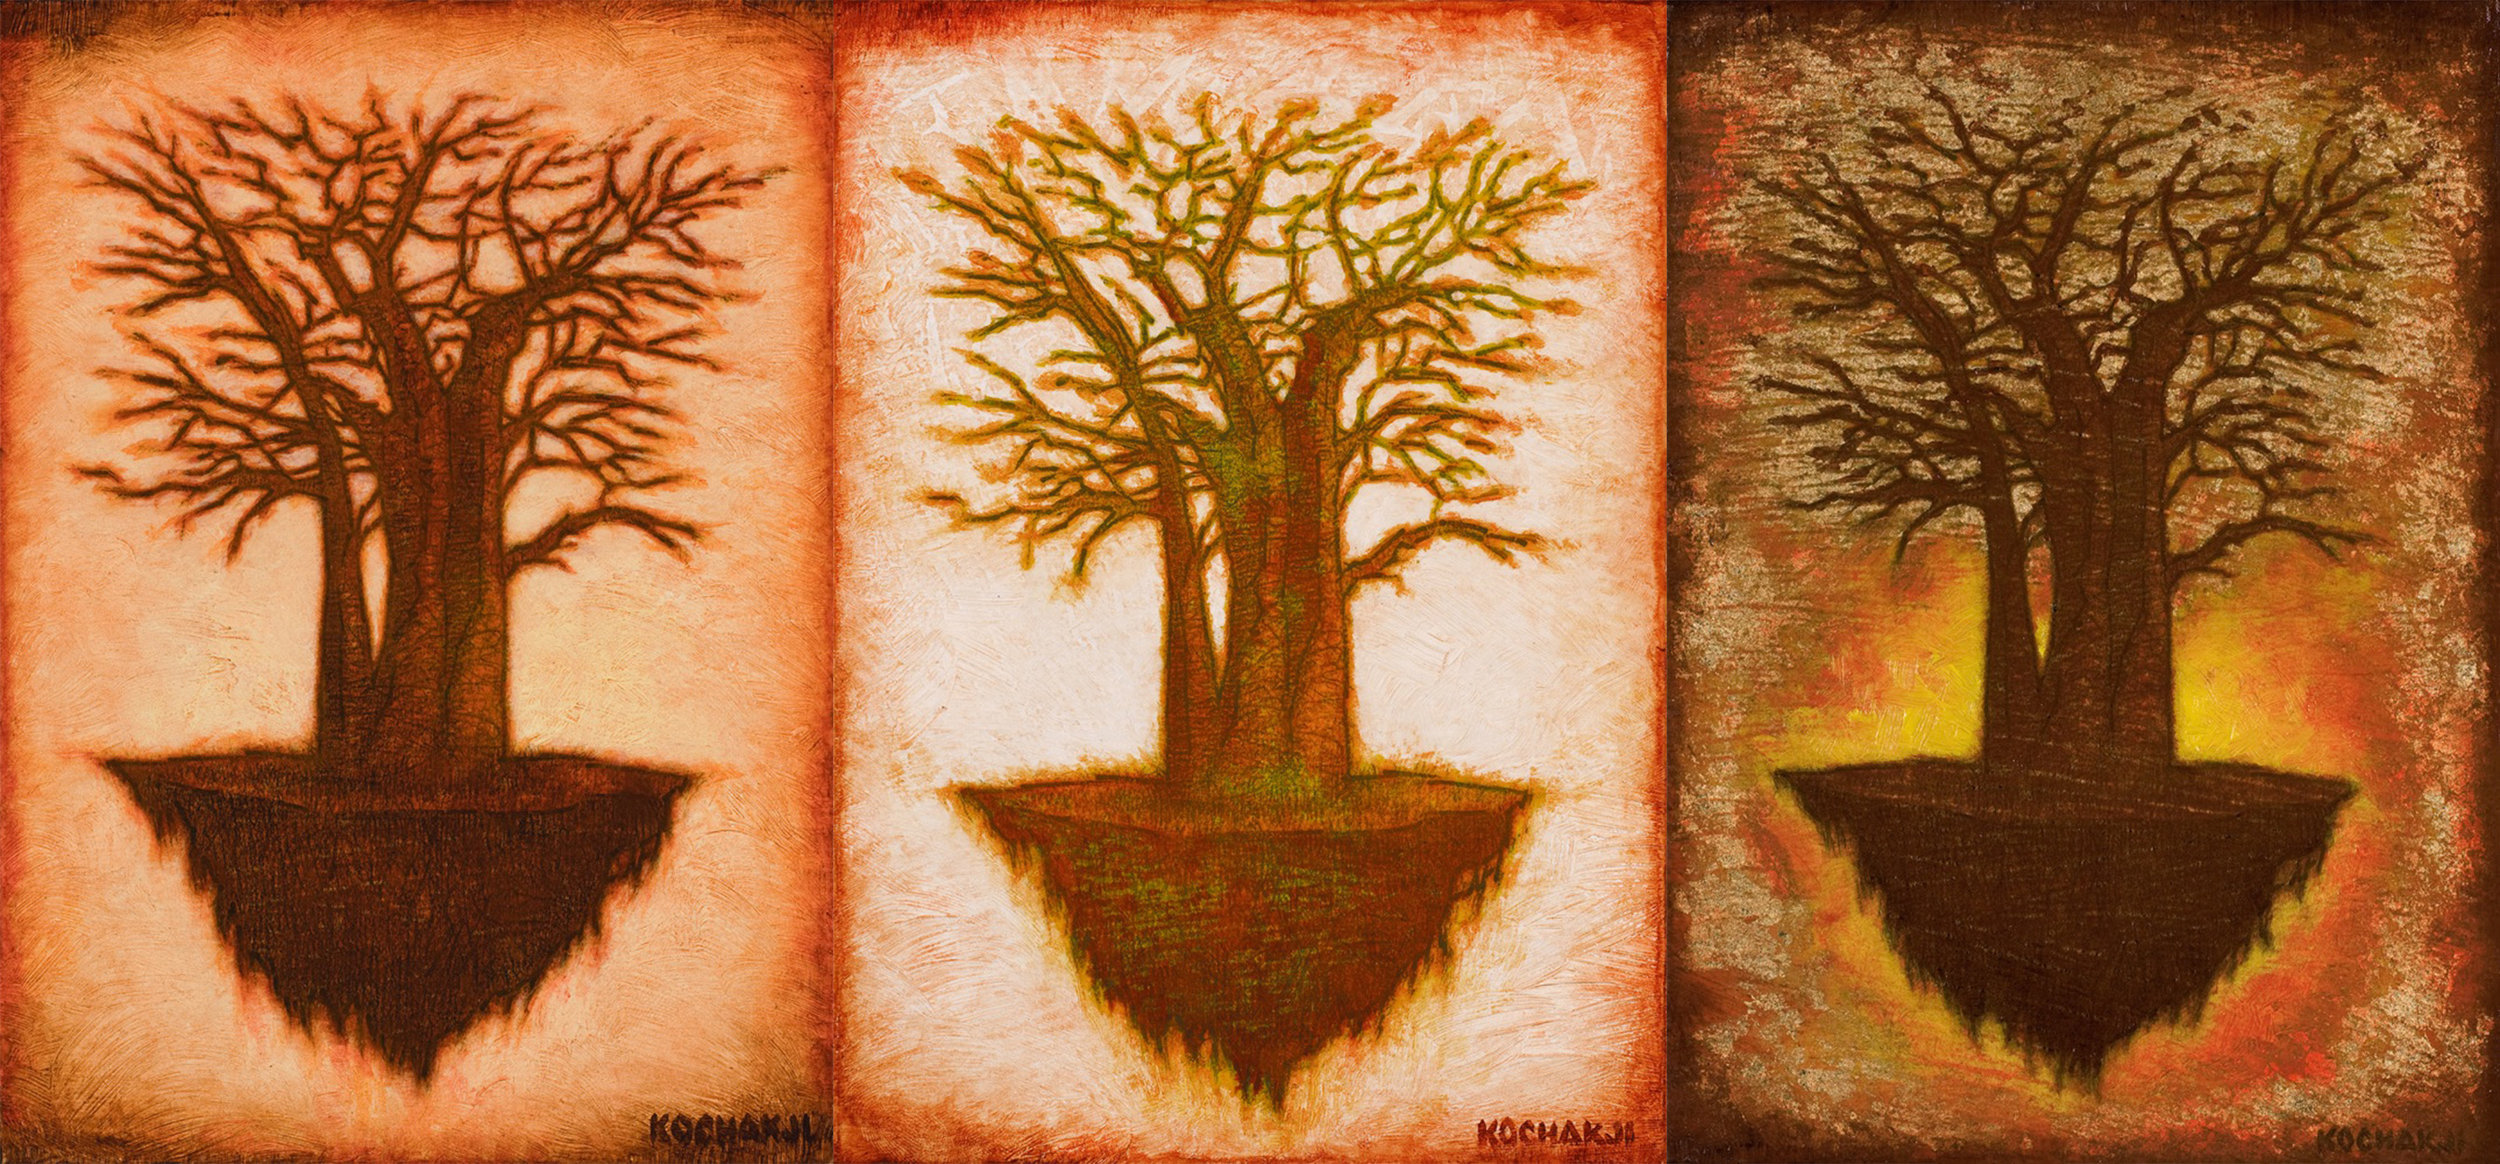 "Umber Root, Ochre Root, Golden Root - oil on panel - 4x6"" (each)"